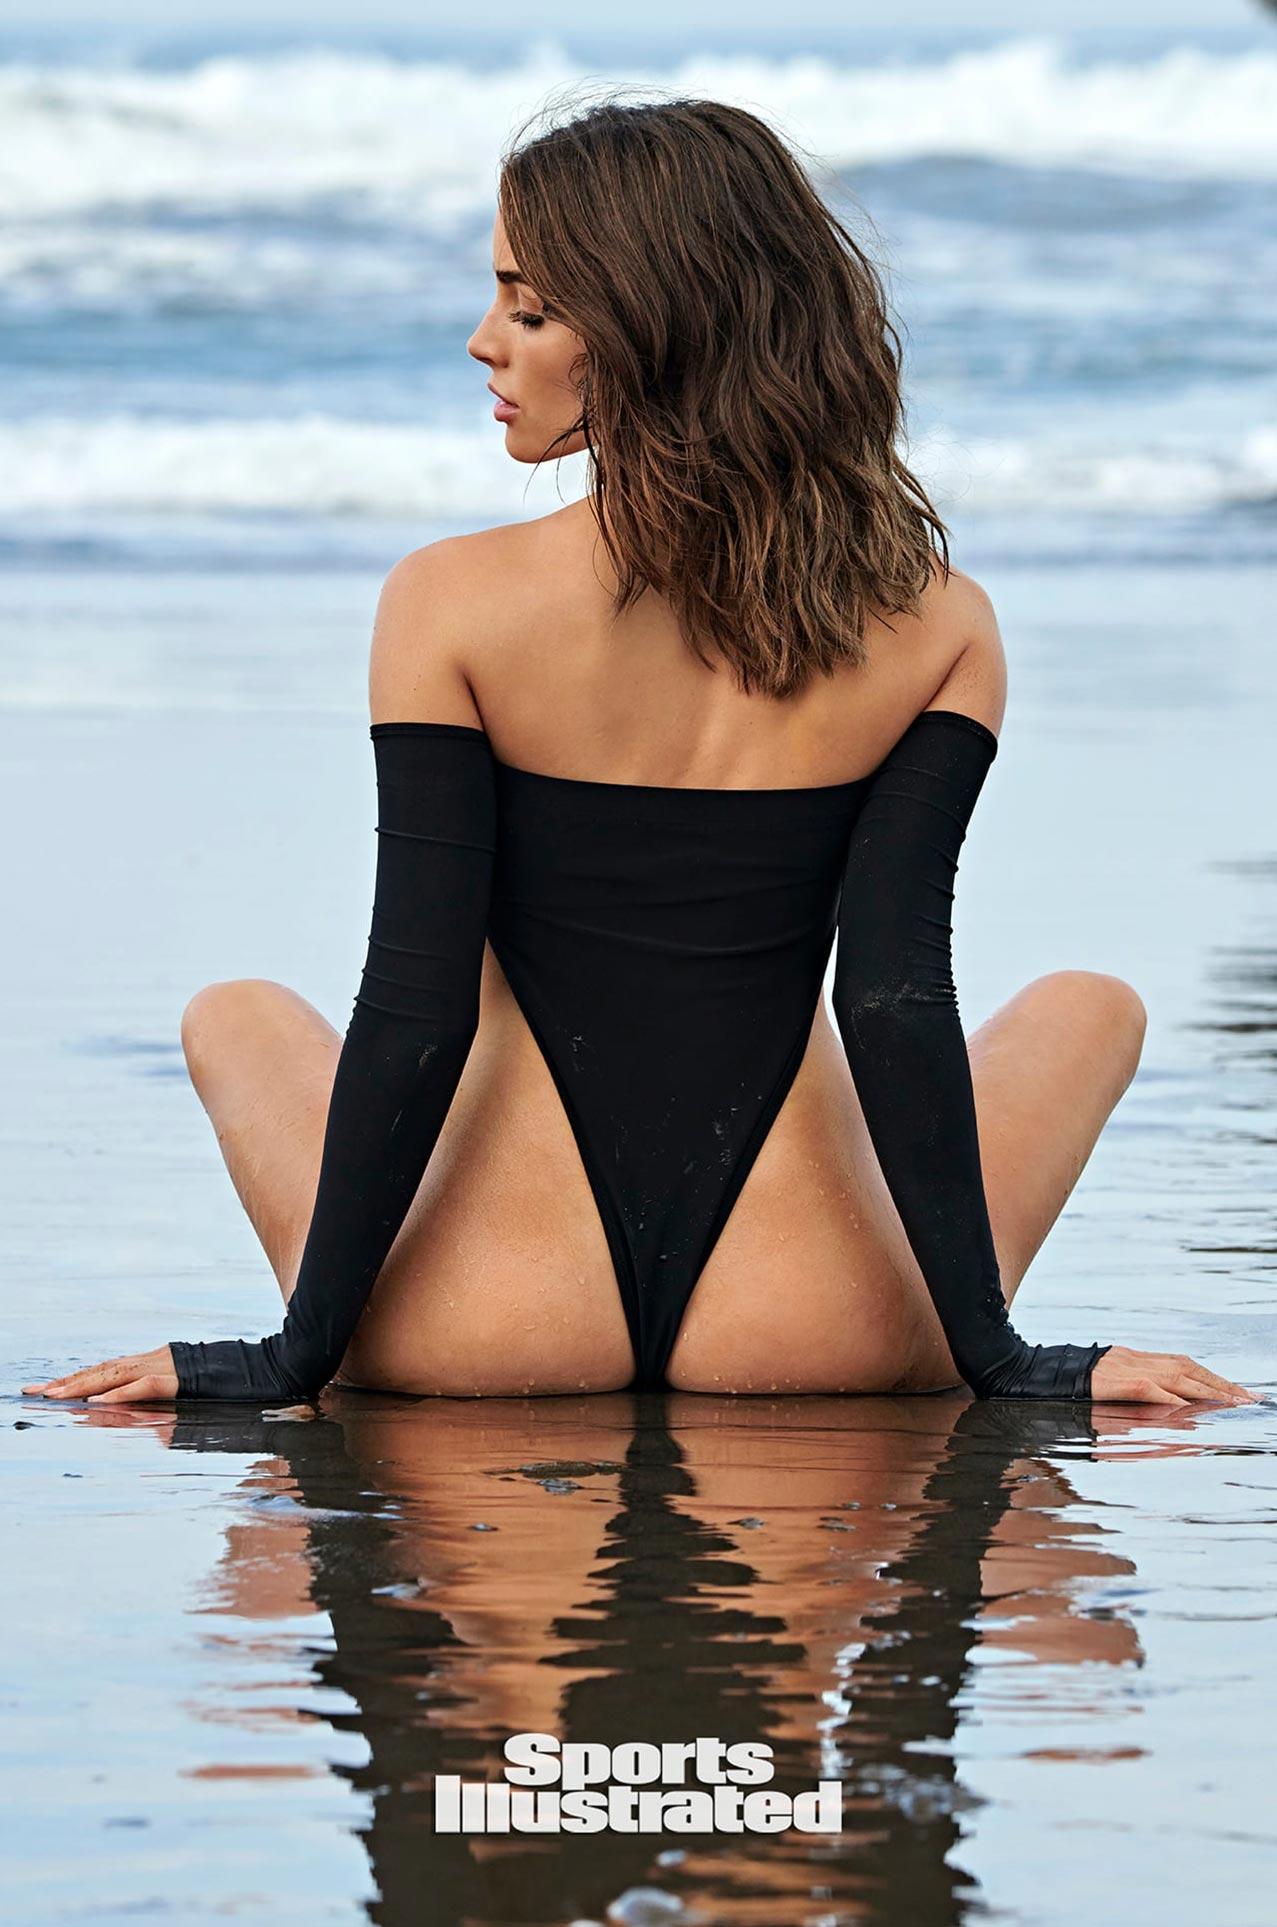 Оливия Калпо в каталоге купальников Sports Illustrated Swimsuit 2020 / фото 02